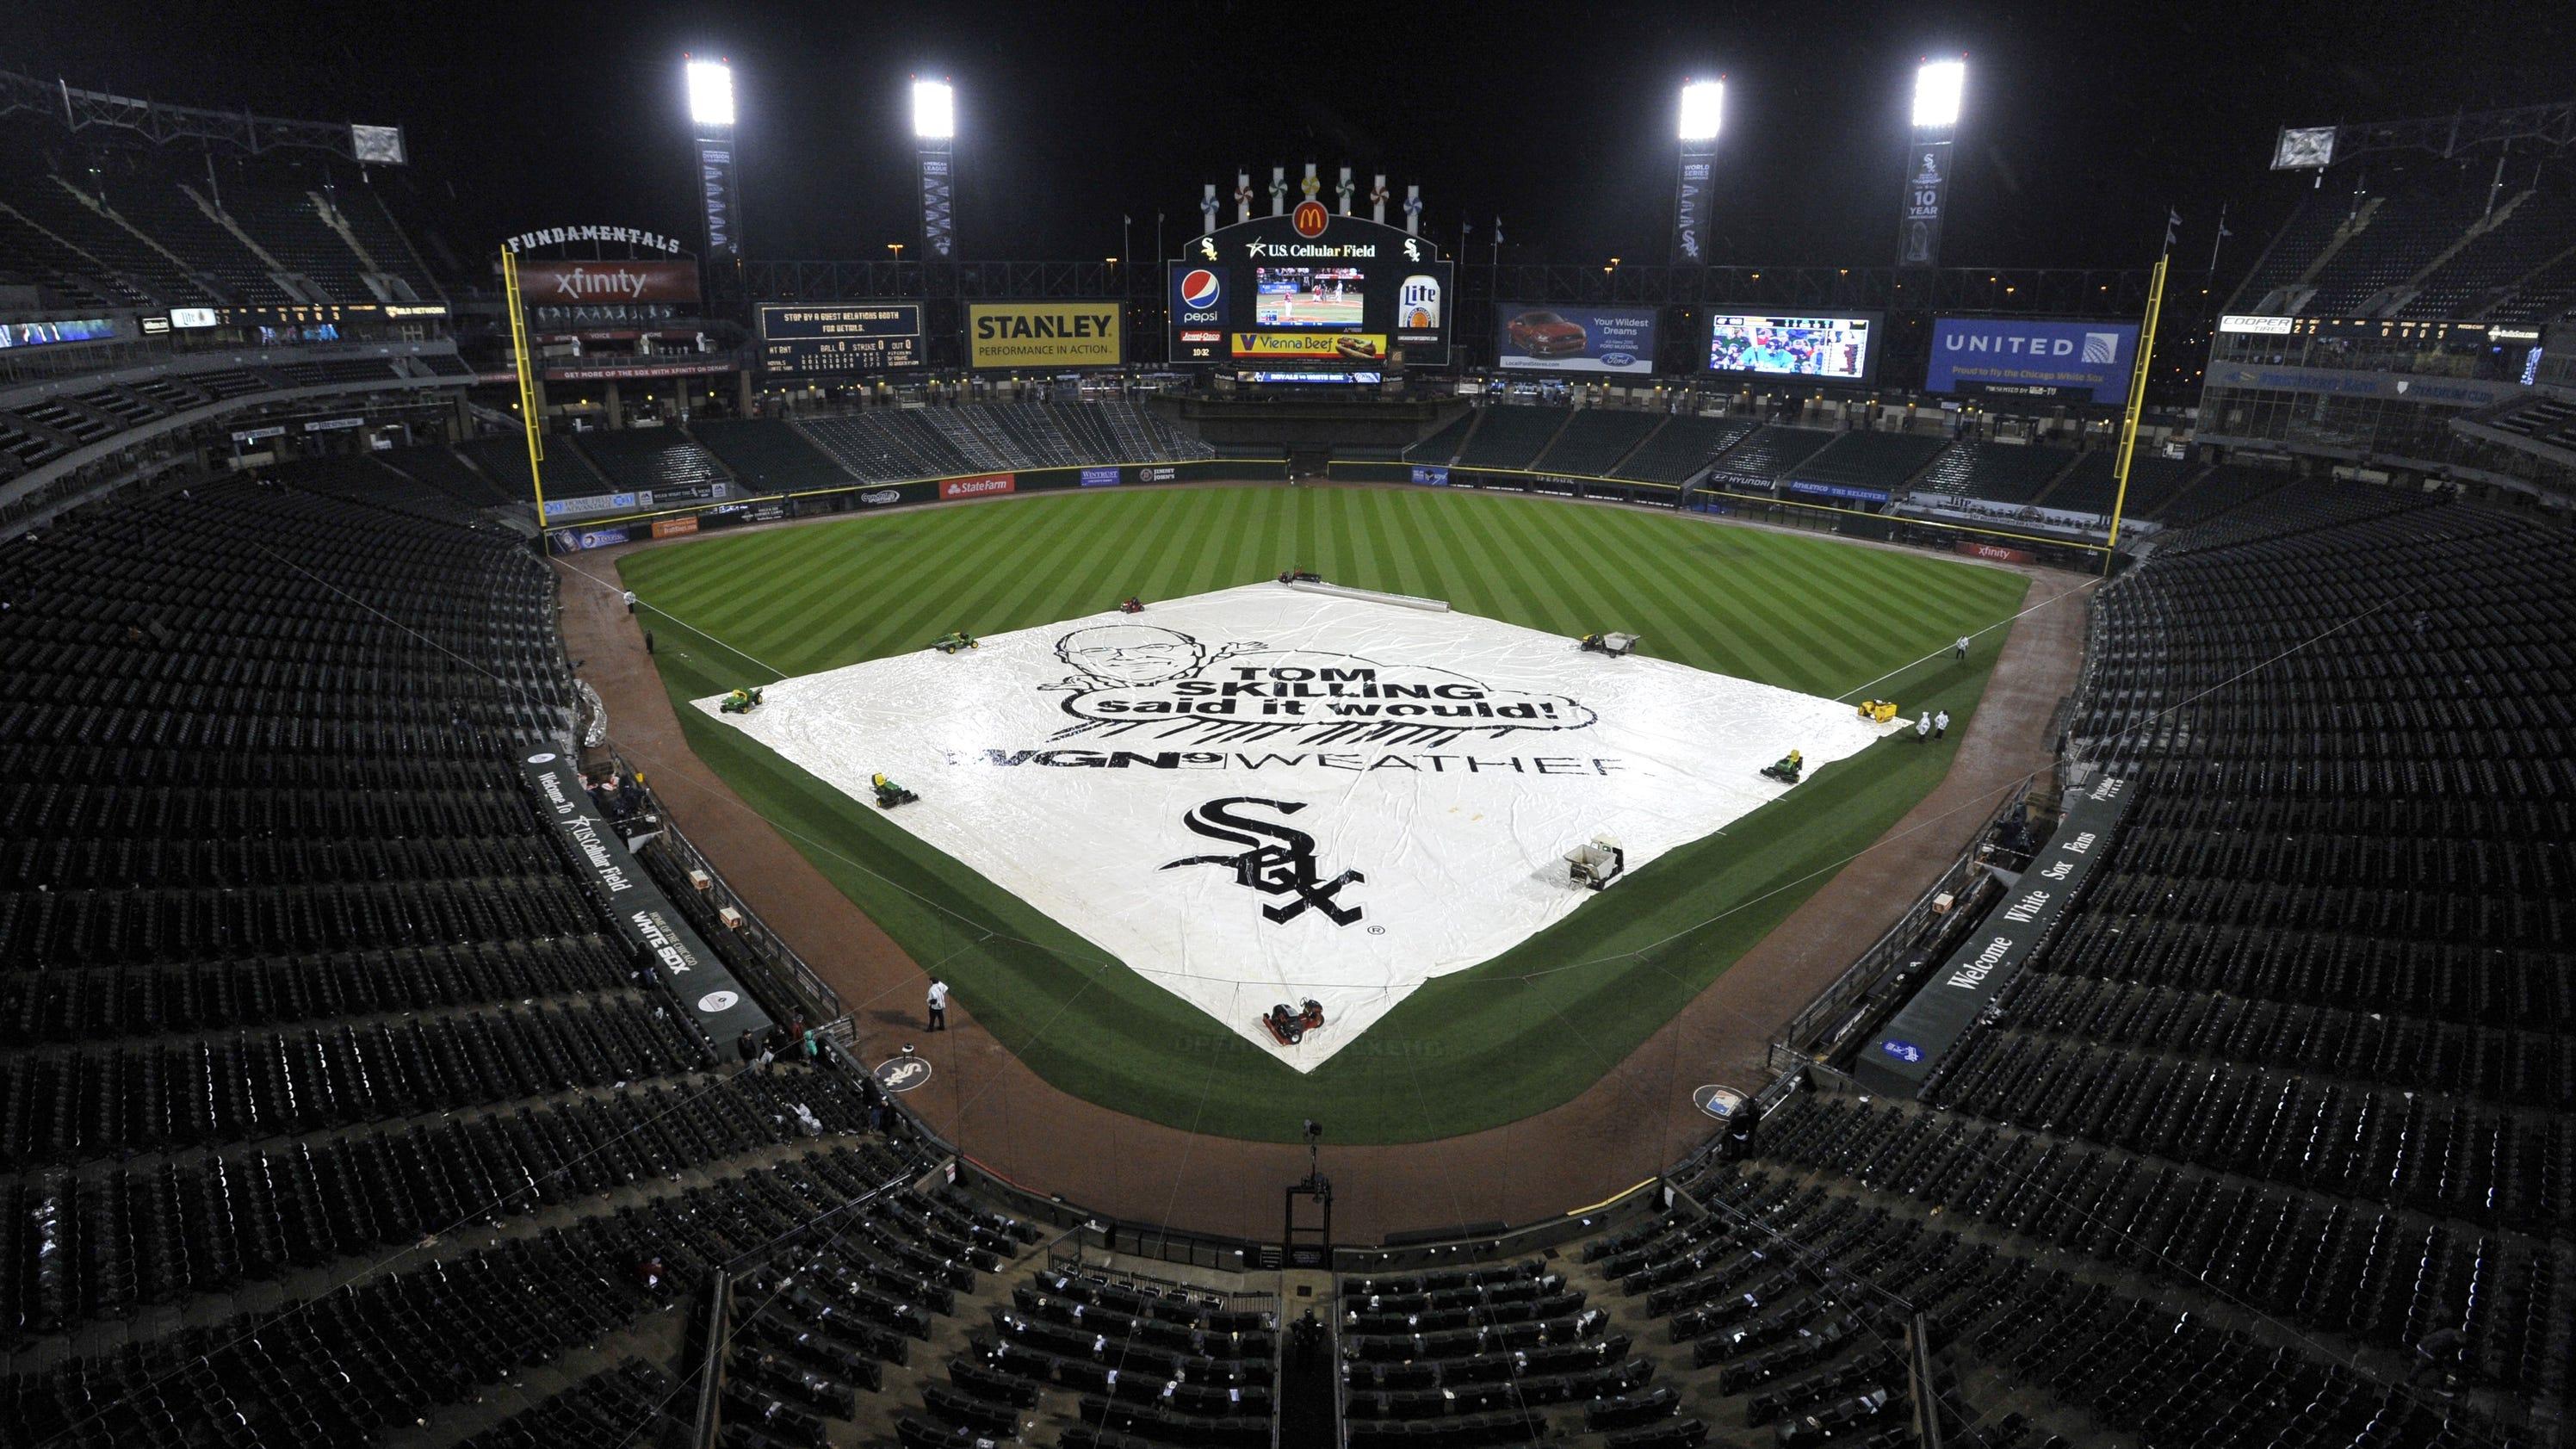 Rain Postpones Royals-White Sox Games To Sunday